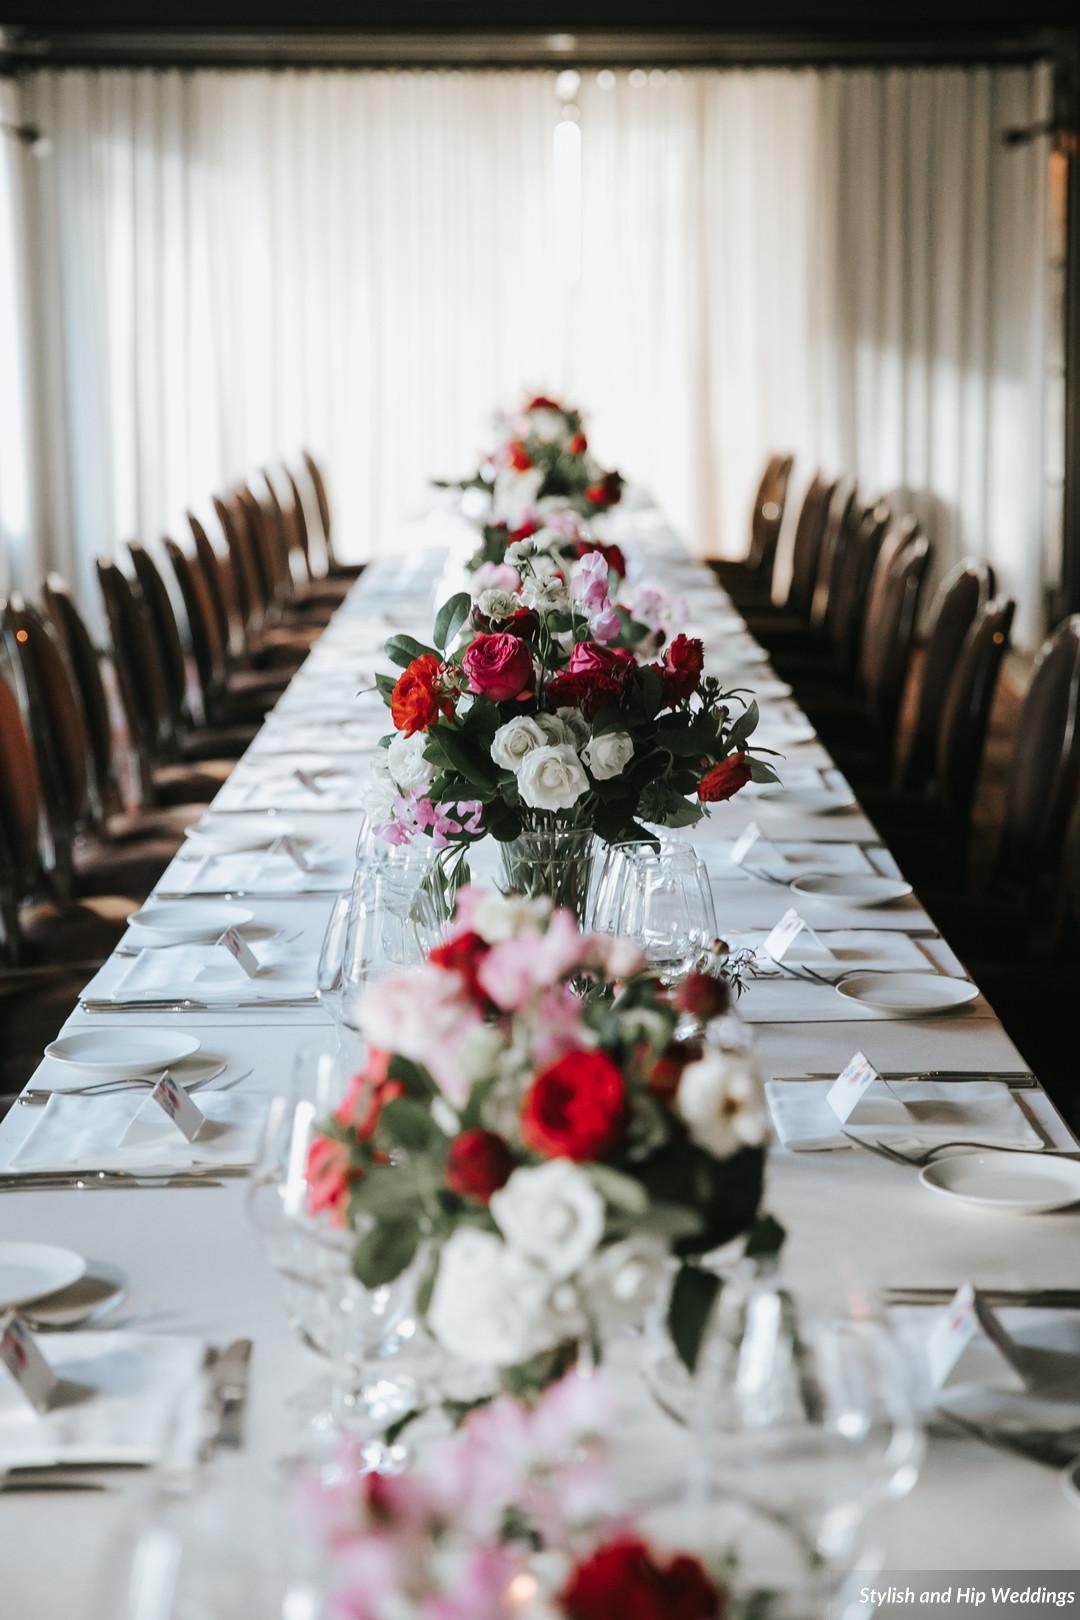 Photography:  Stylish Hip Weddings   Planning:  deVivre   Venue:  The Nomad Hotel